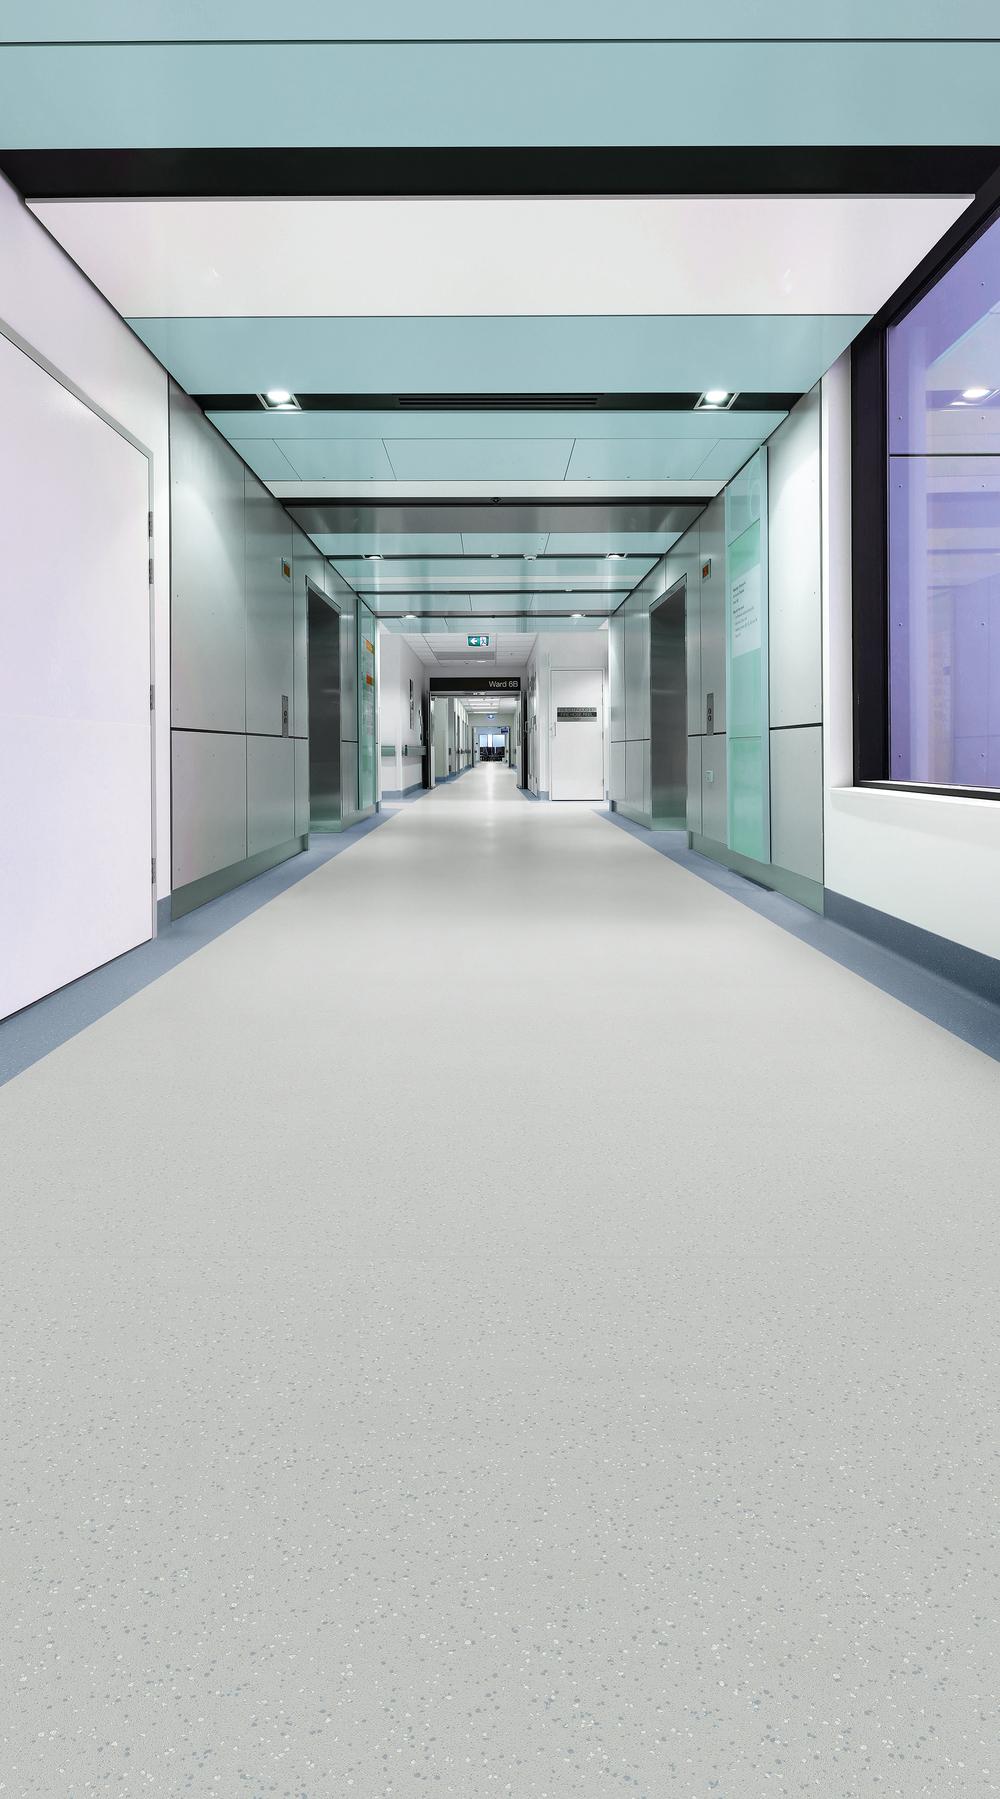 CF 5208 5202 Rainstorm_HealthcareCorridor.jpg